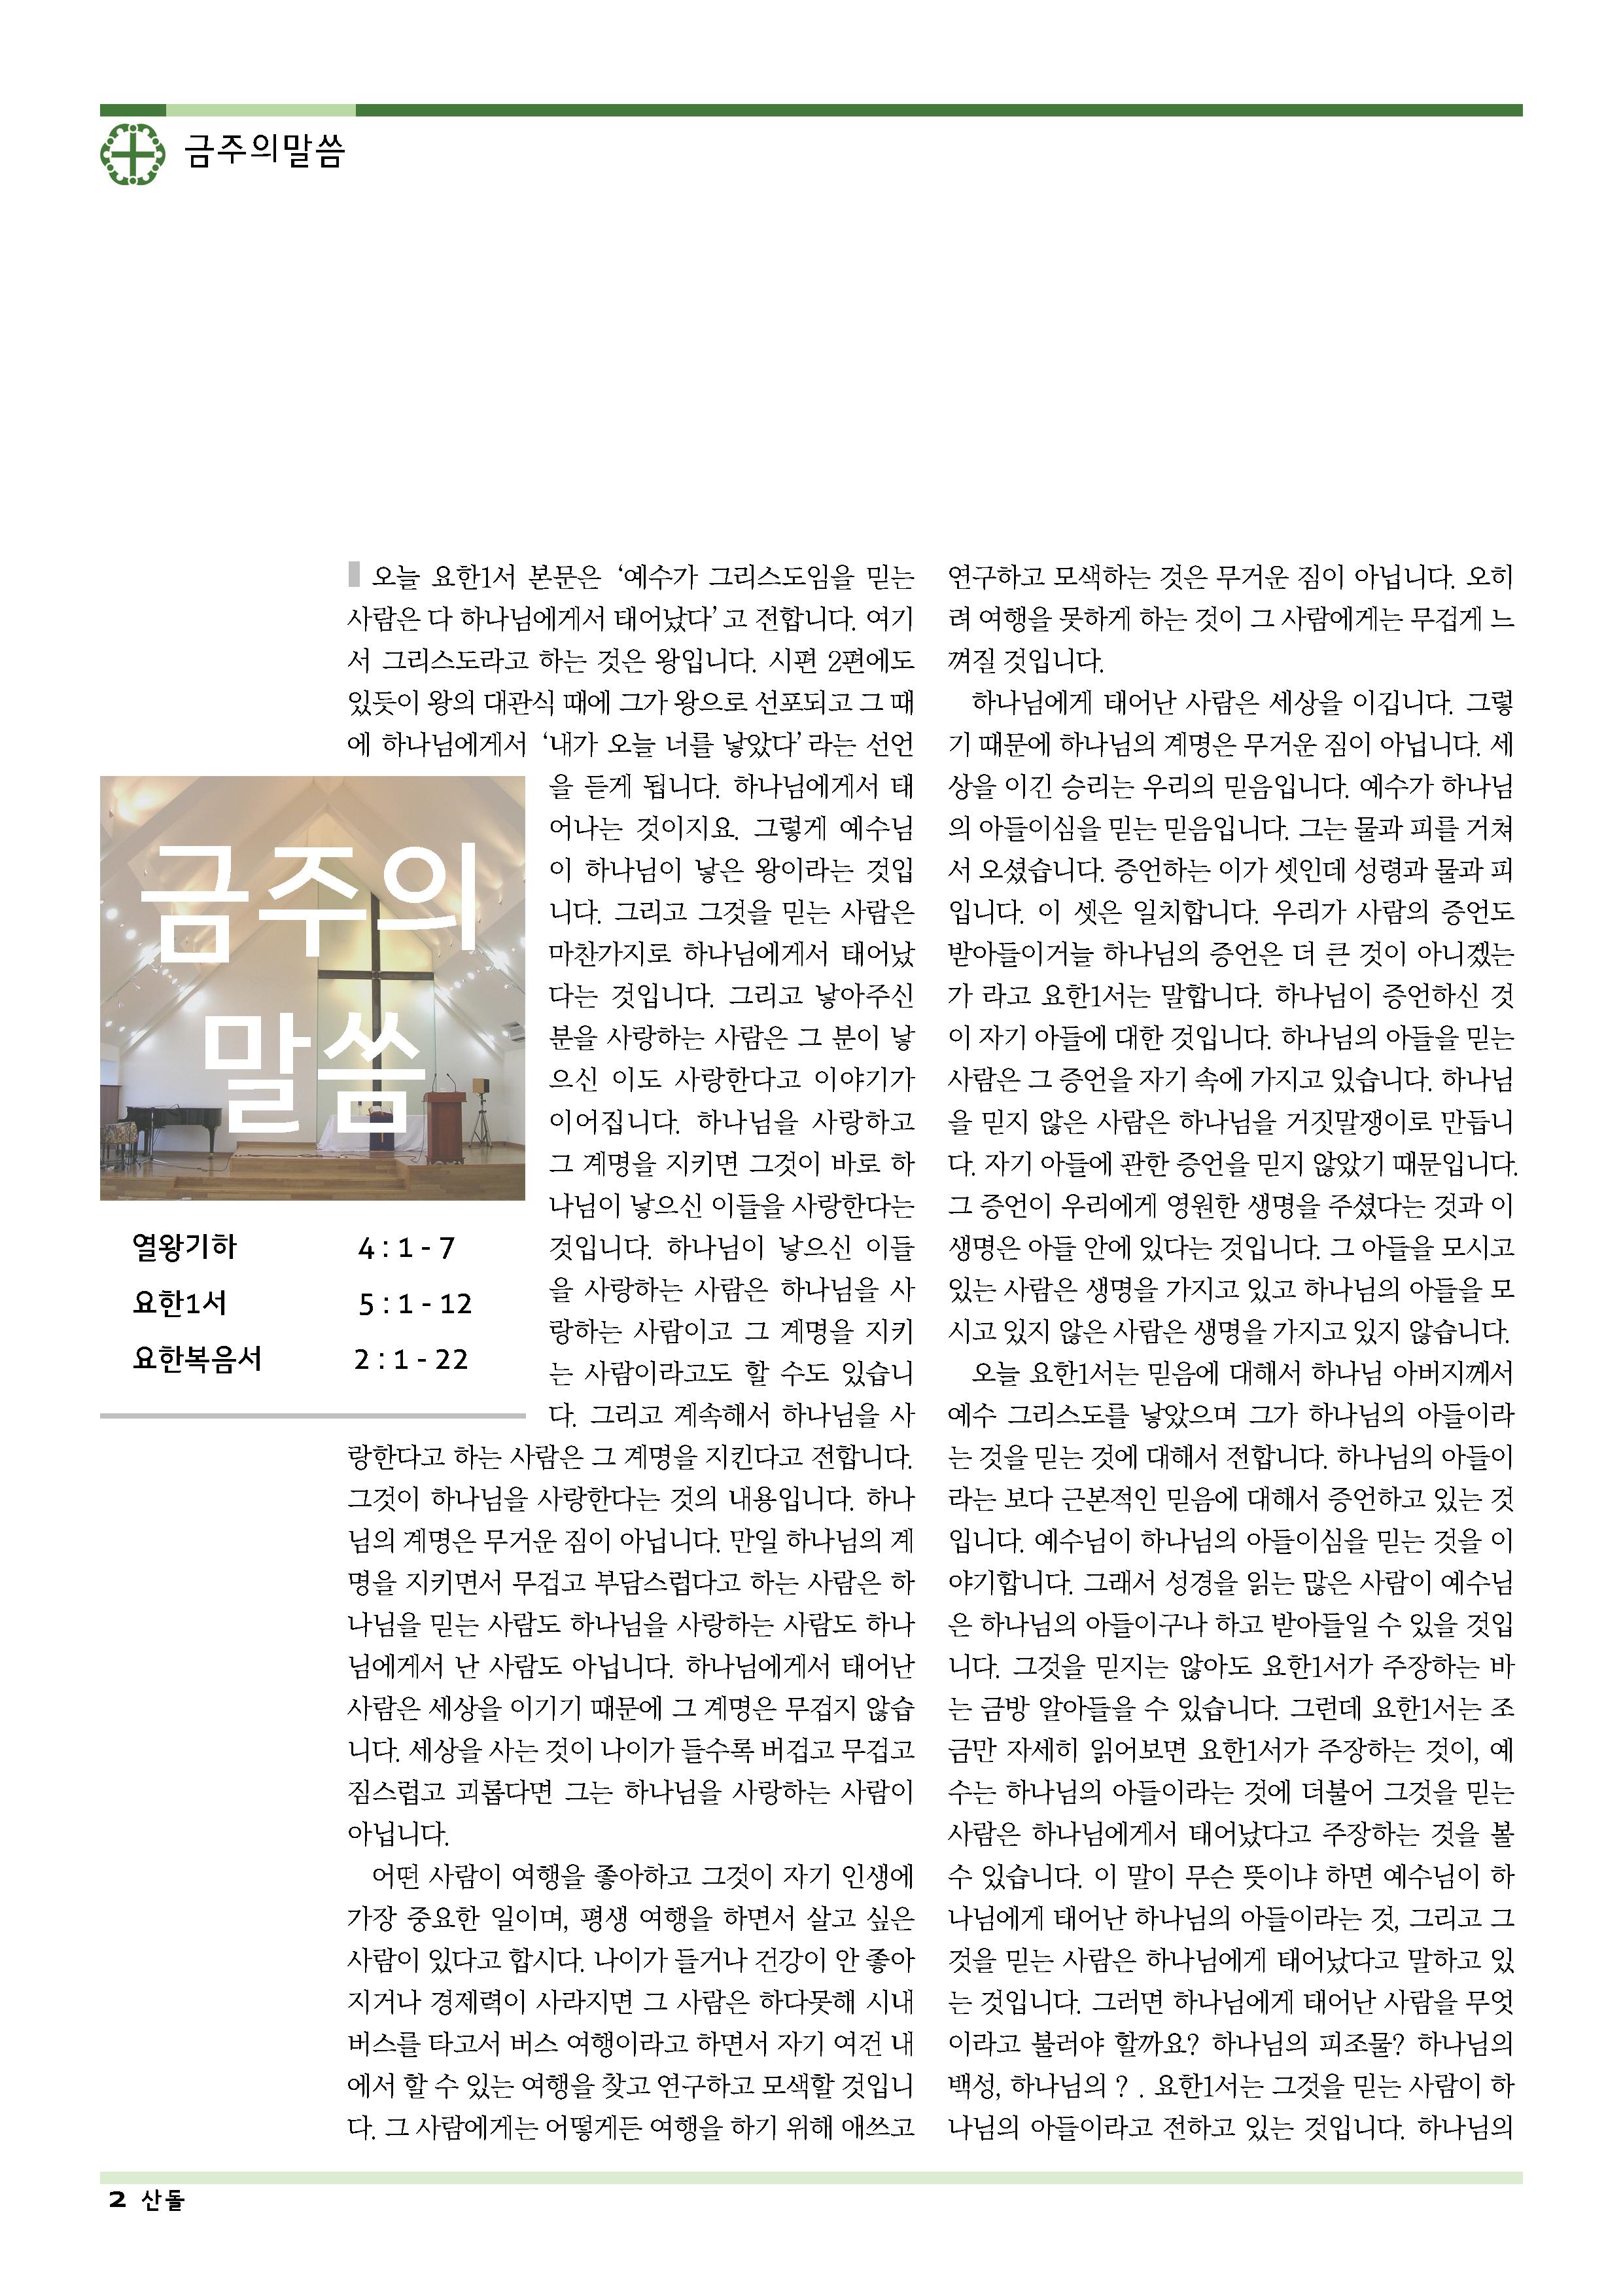 18sdjb0128_페이지_02.png